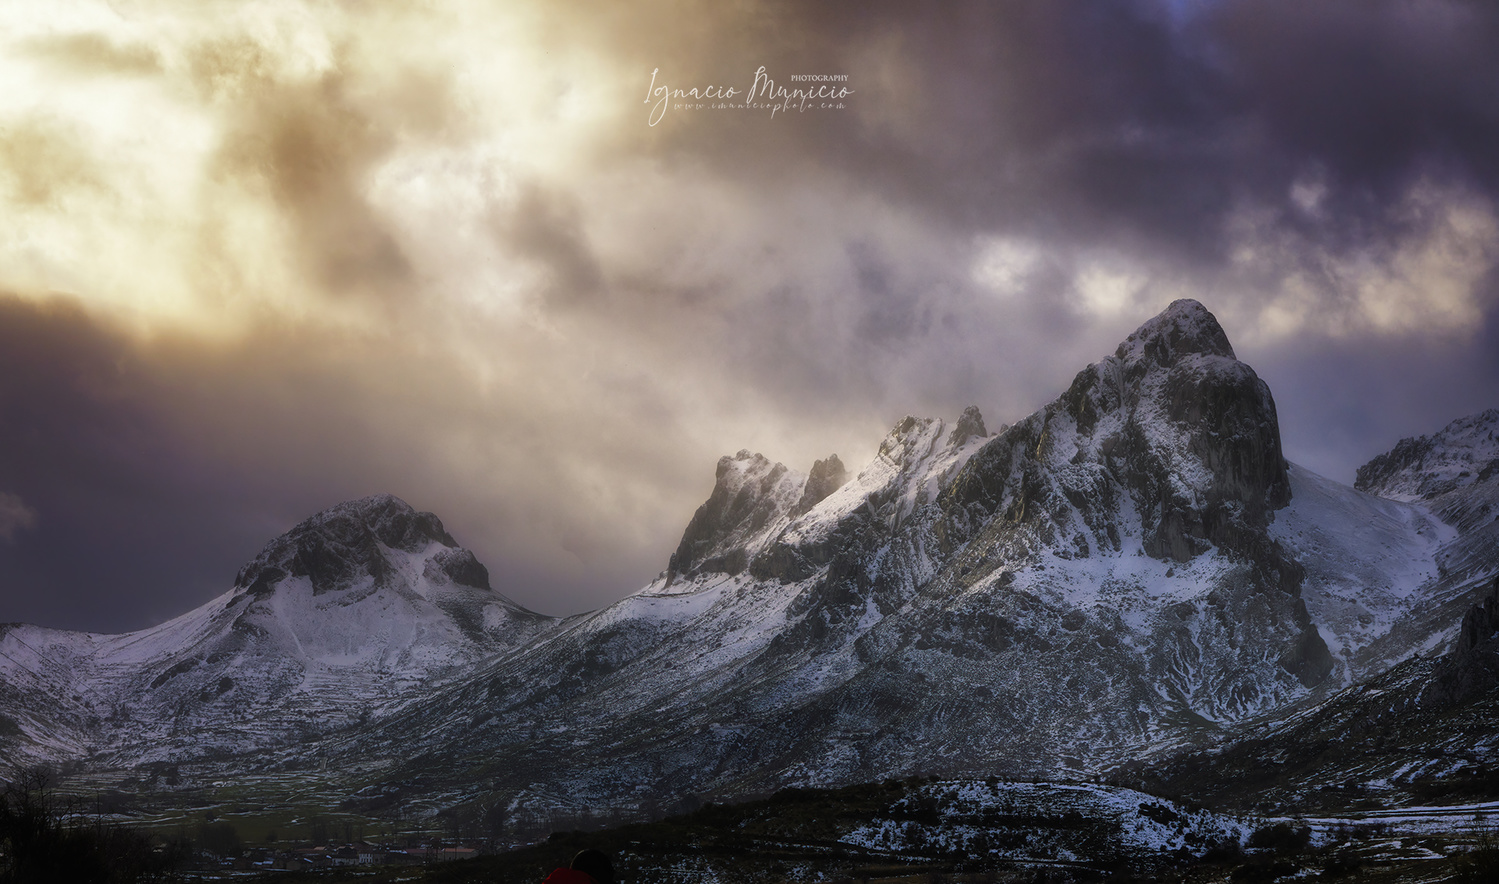 The last lights by Ignacio Municio